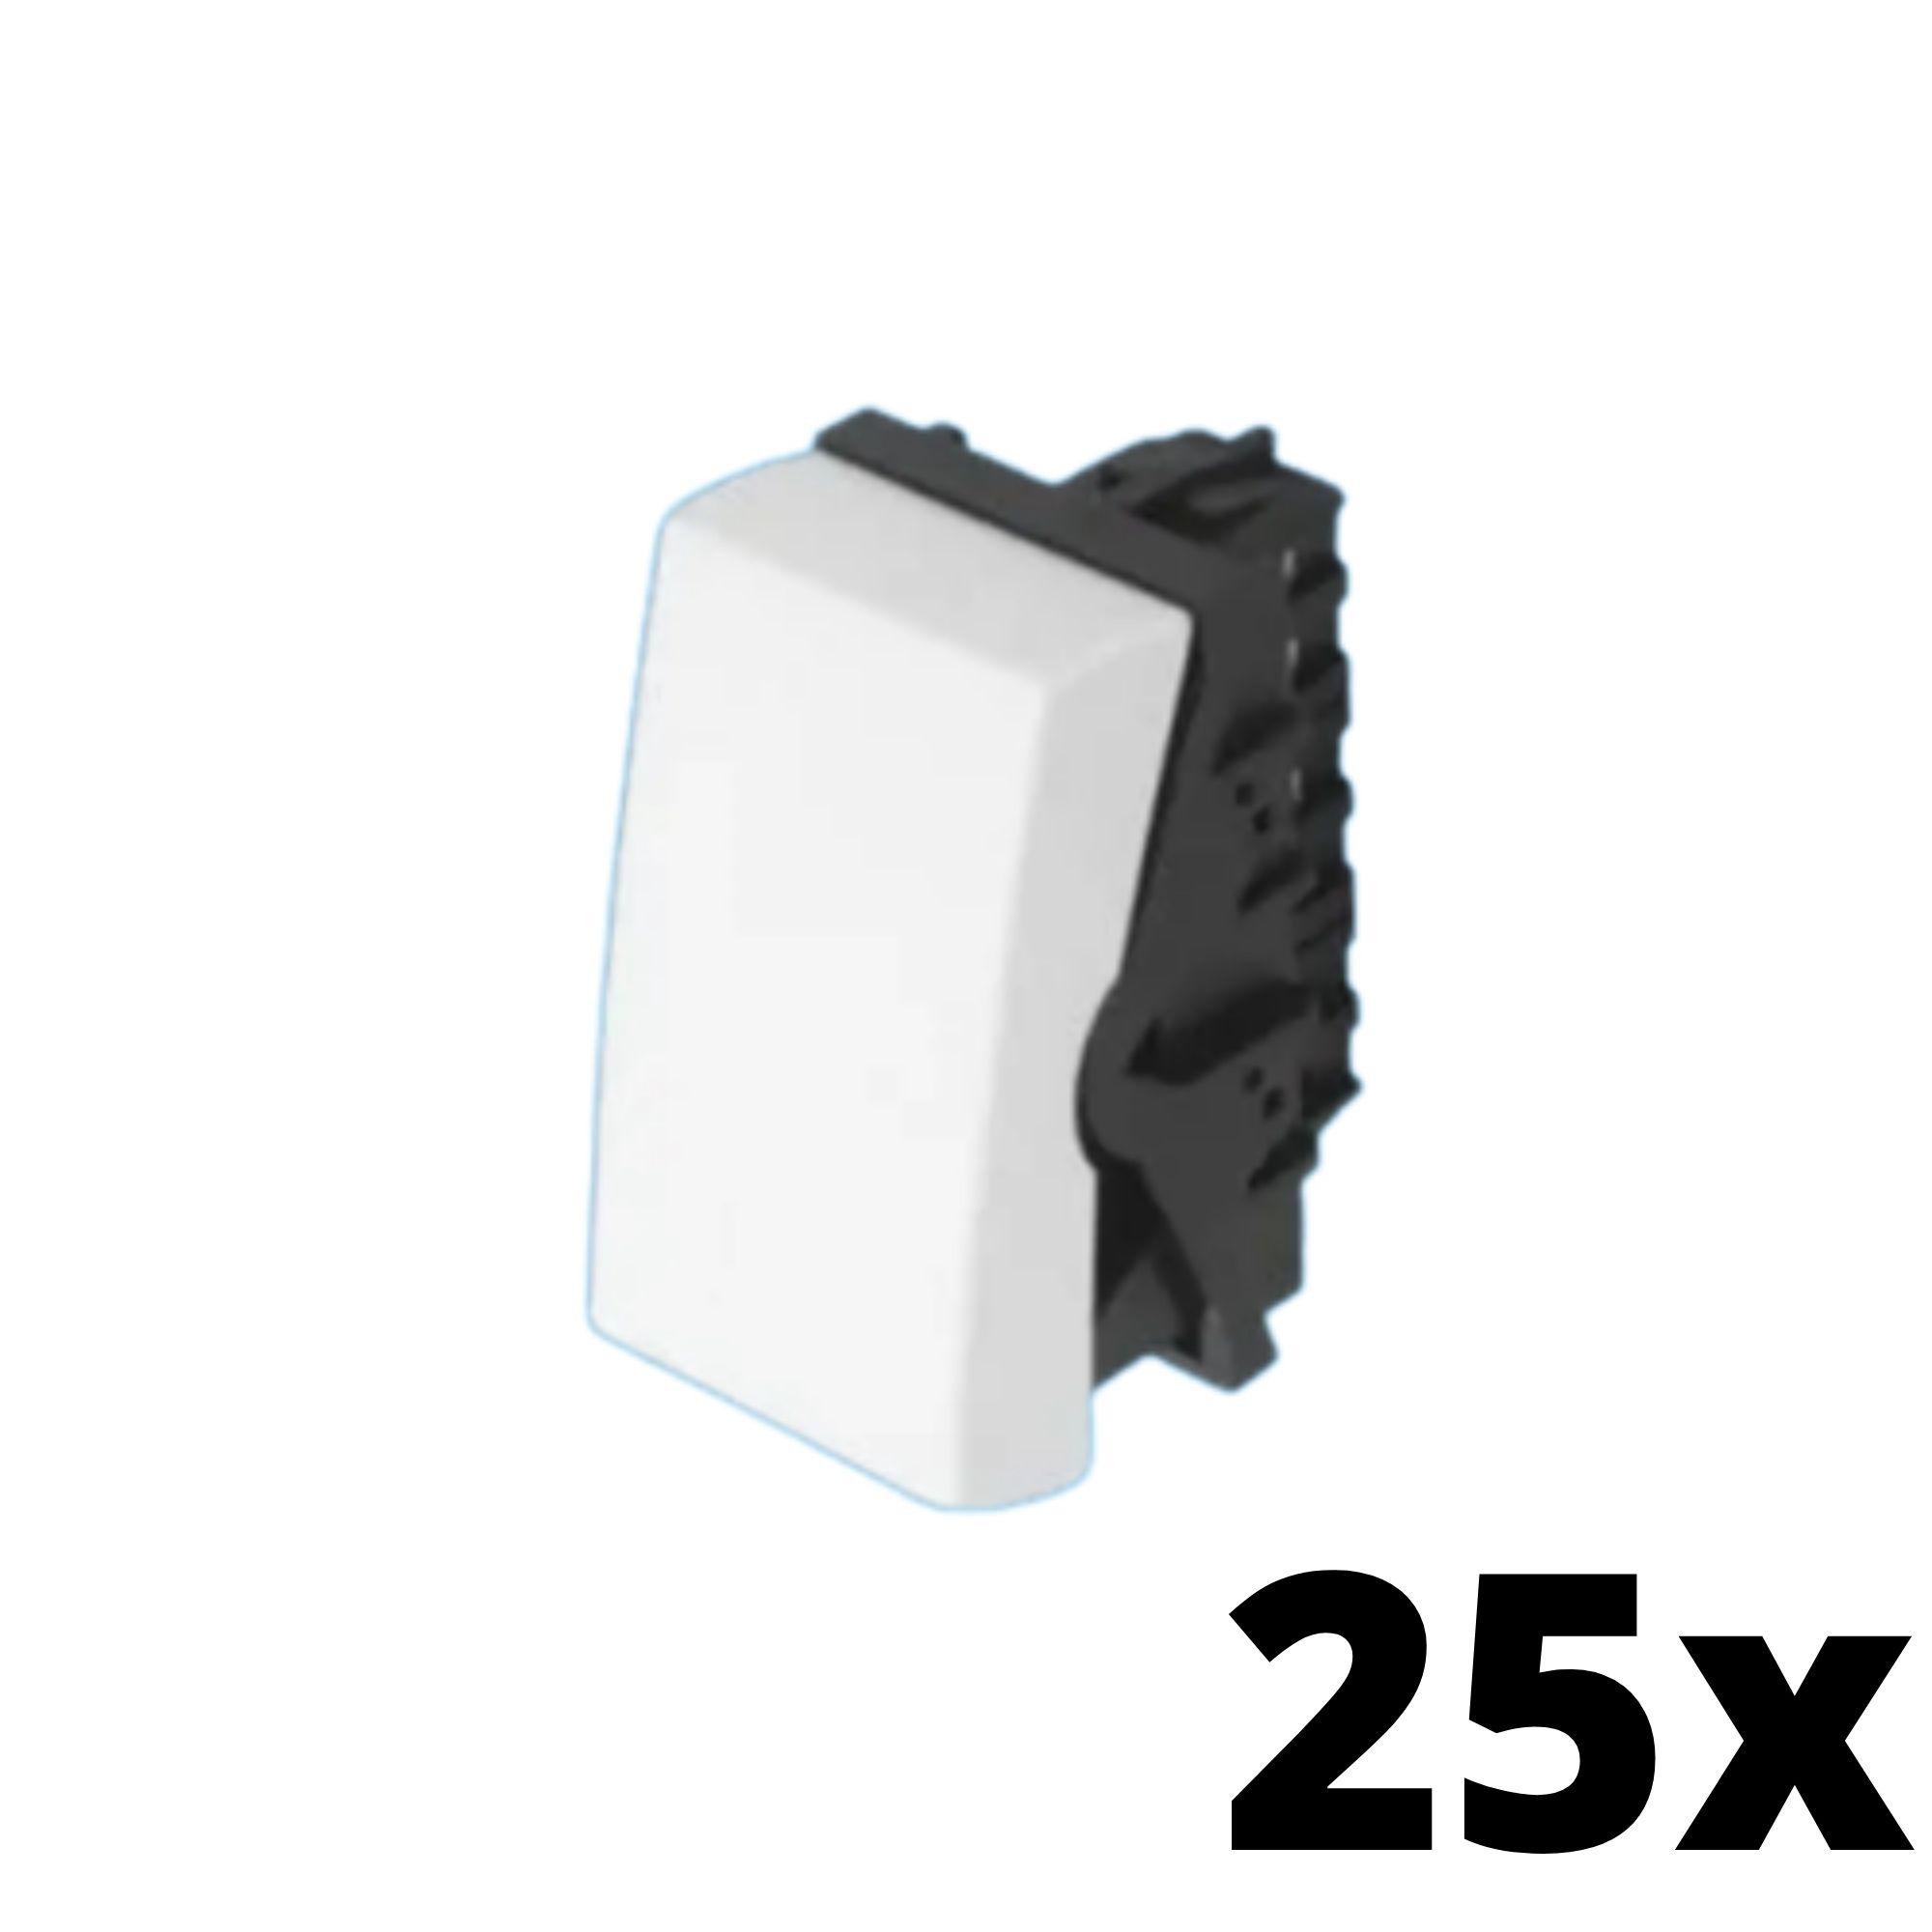 Kit 25 und Evidence Módulo de Interruptor Intermediário